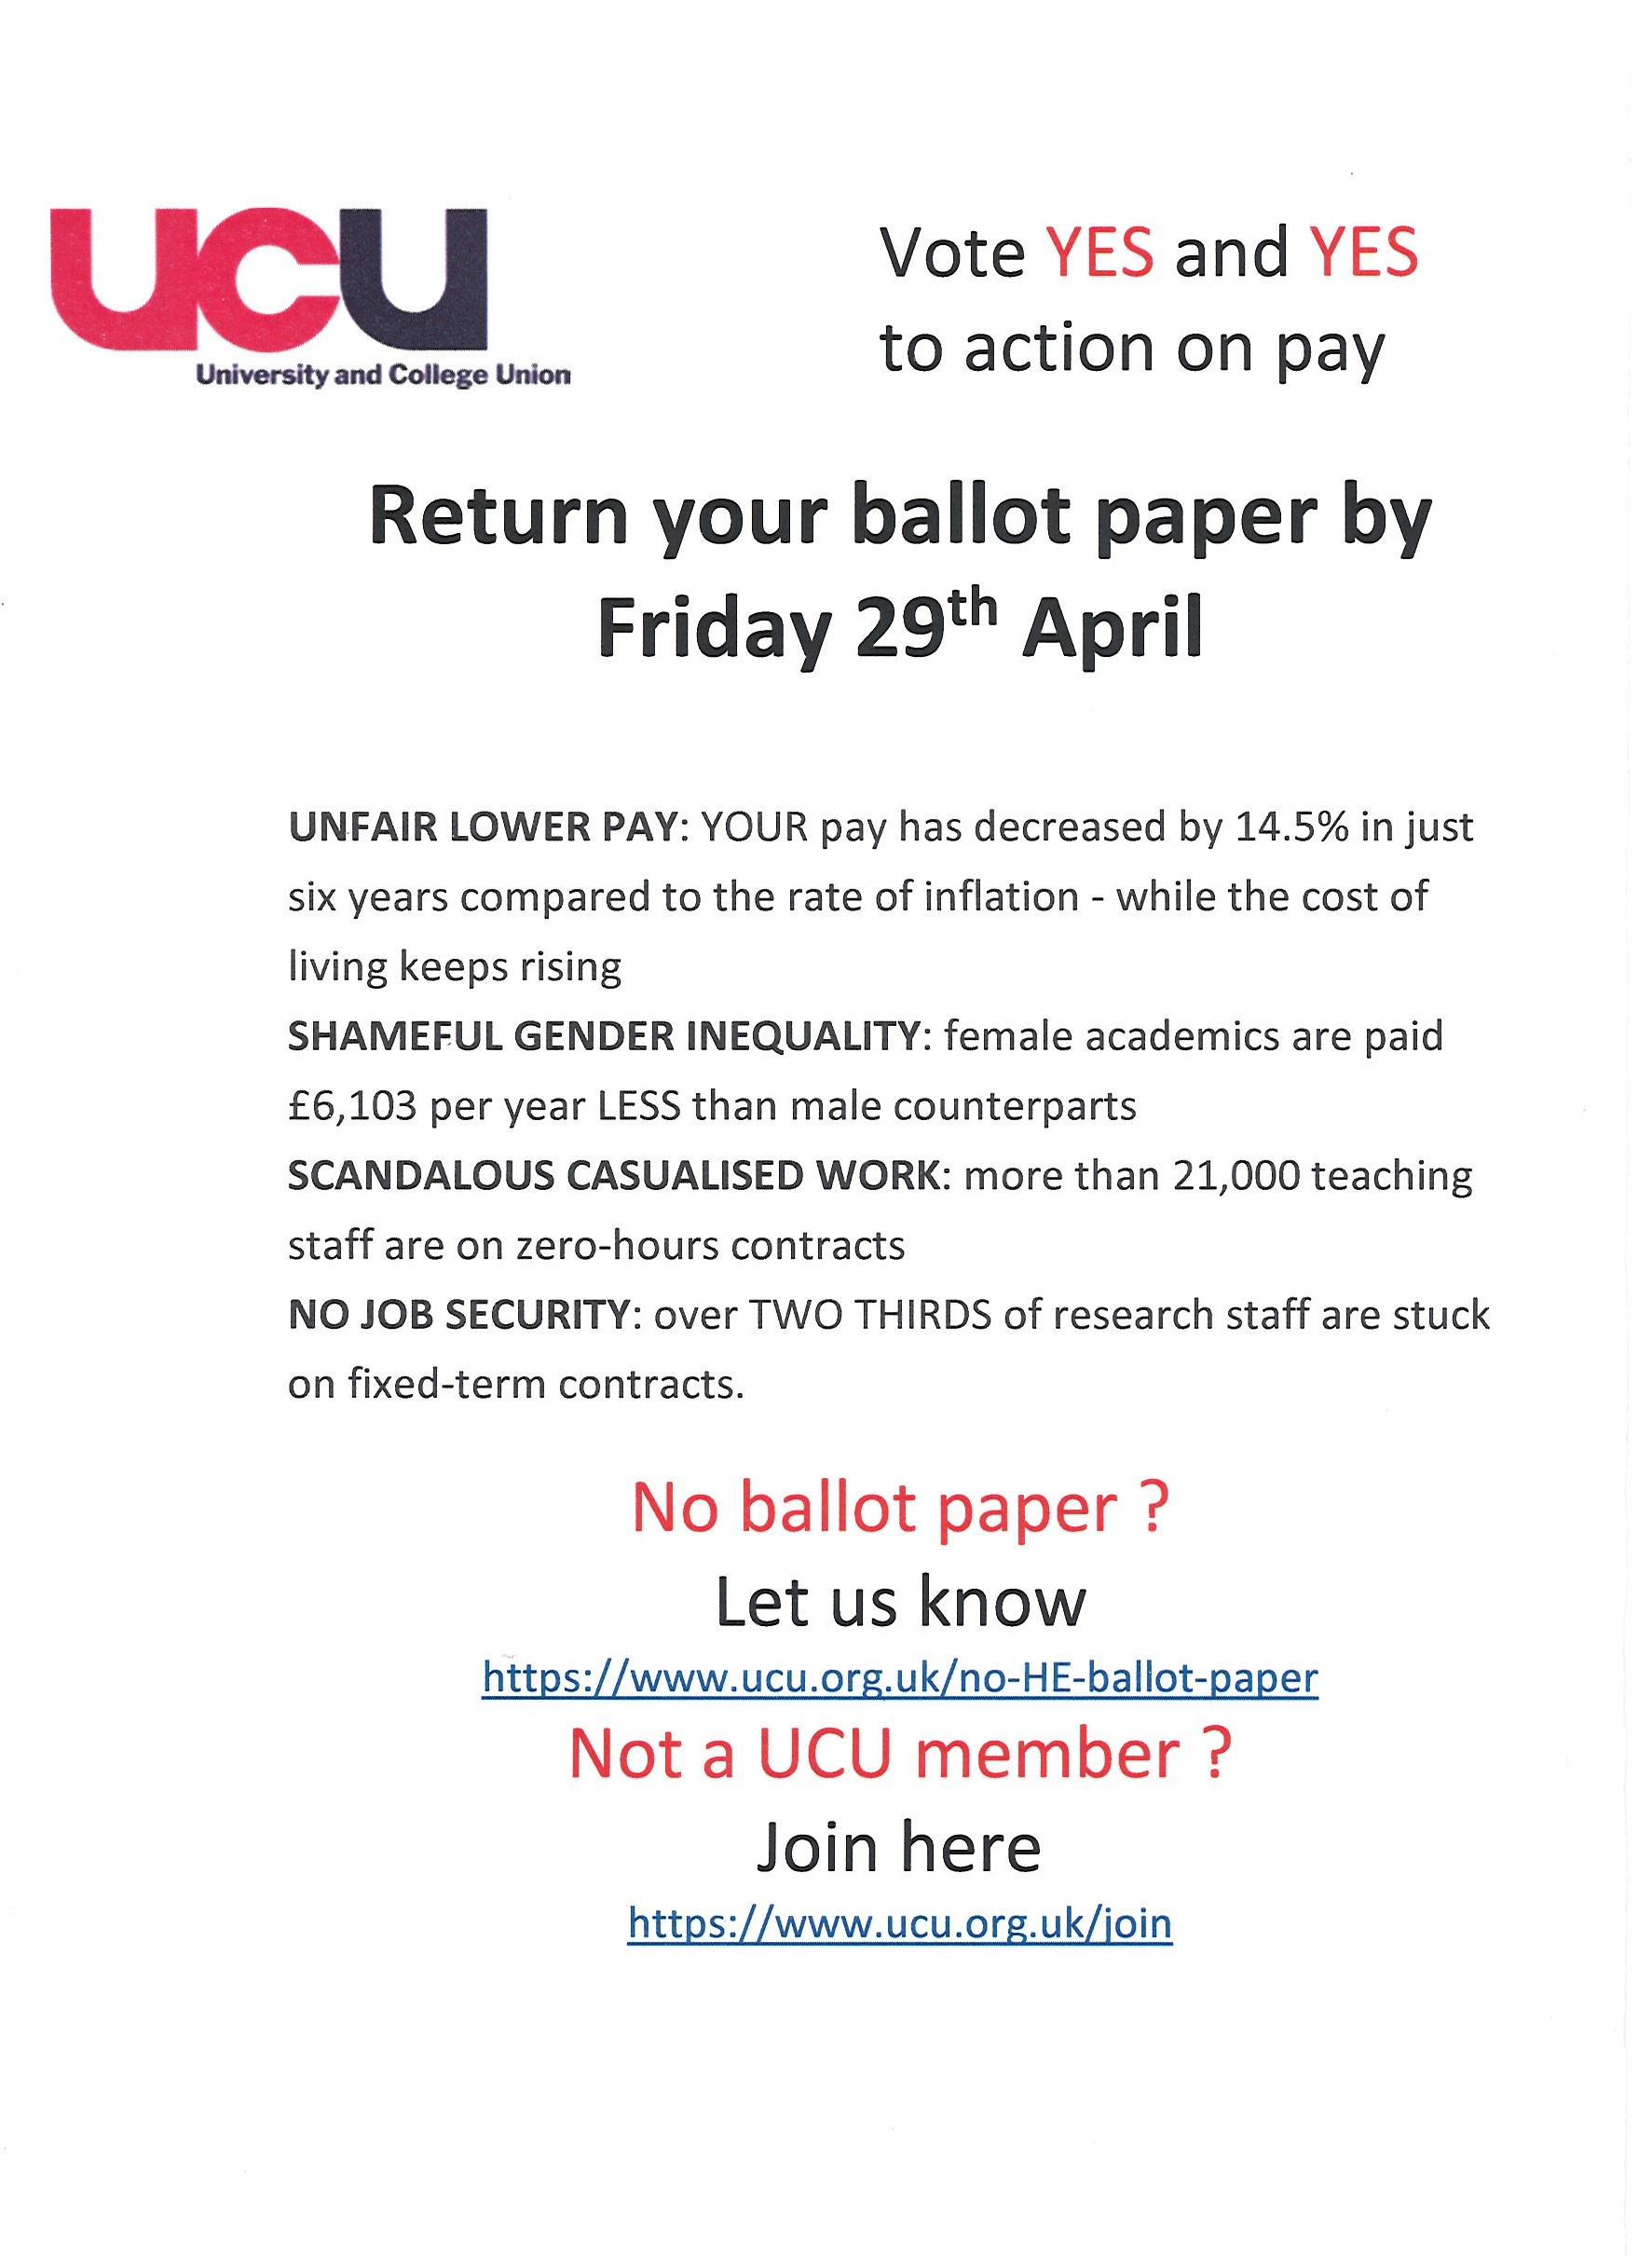 ballot reminder2